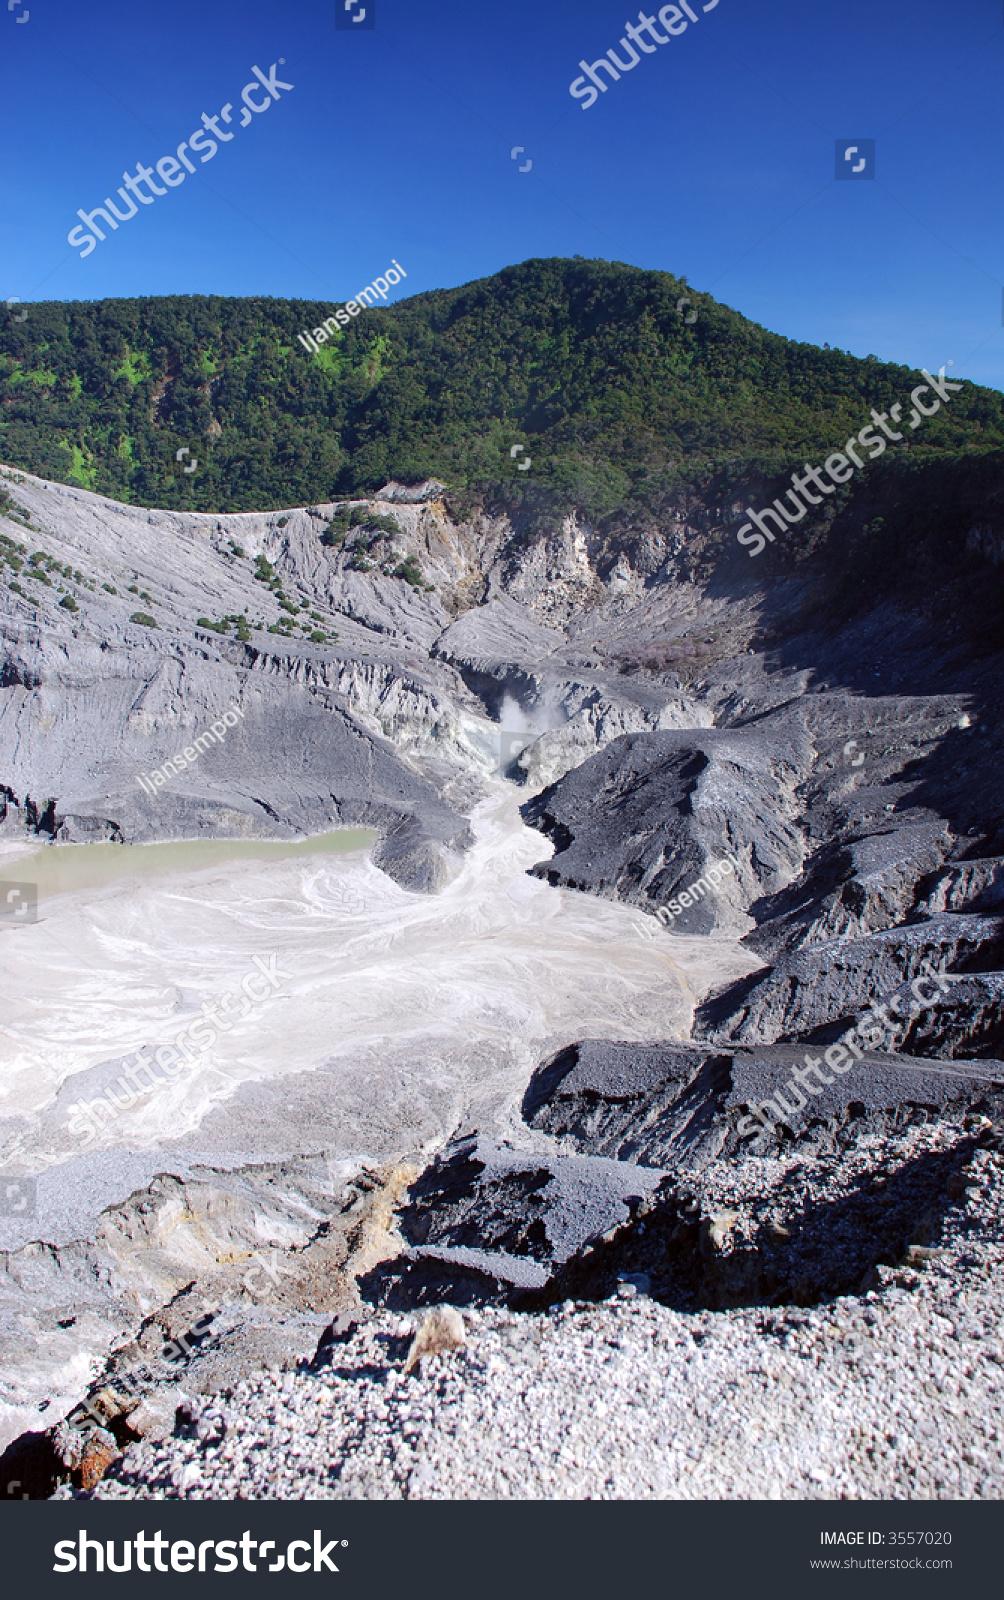 Mt. Tangkuban Perahu - Inactive Volcano In Bandung ...